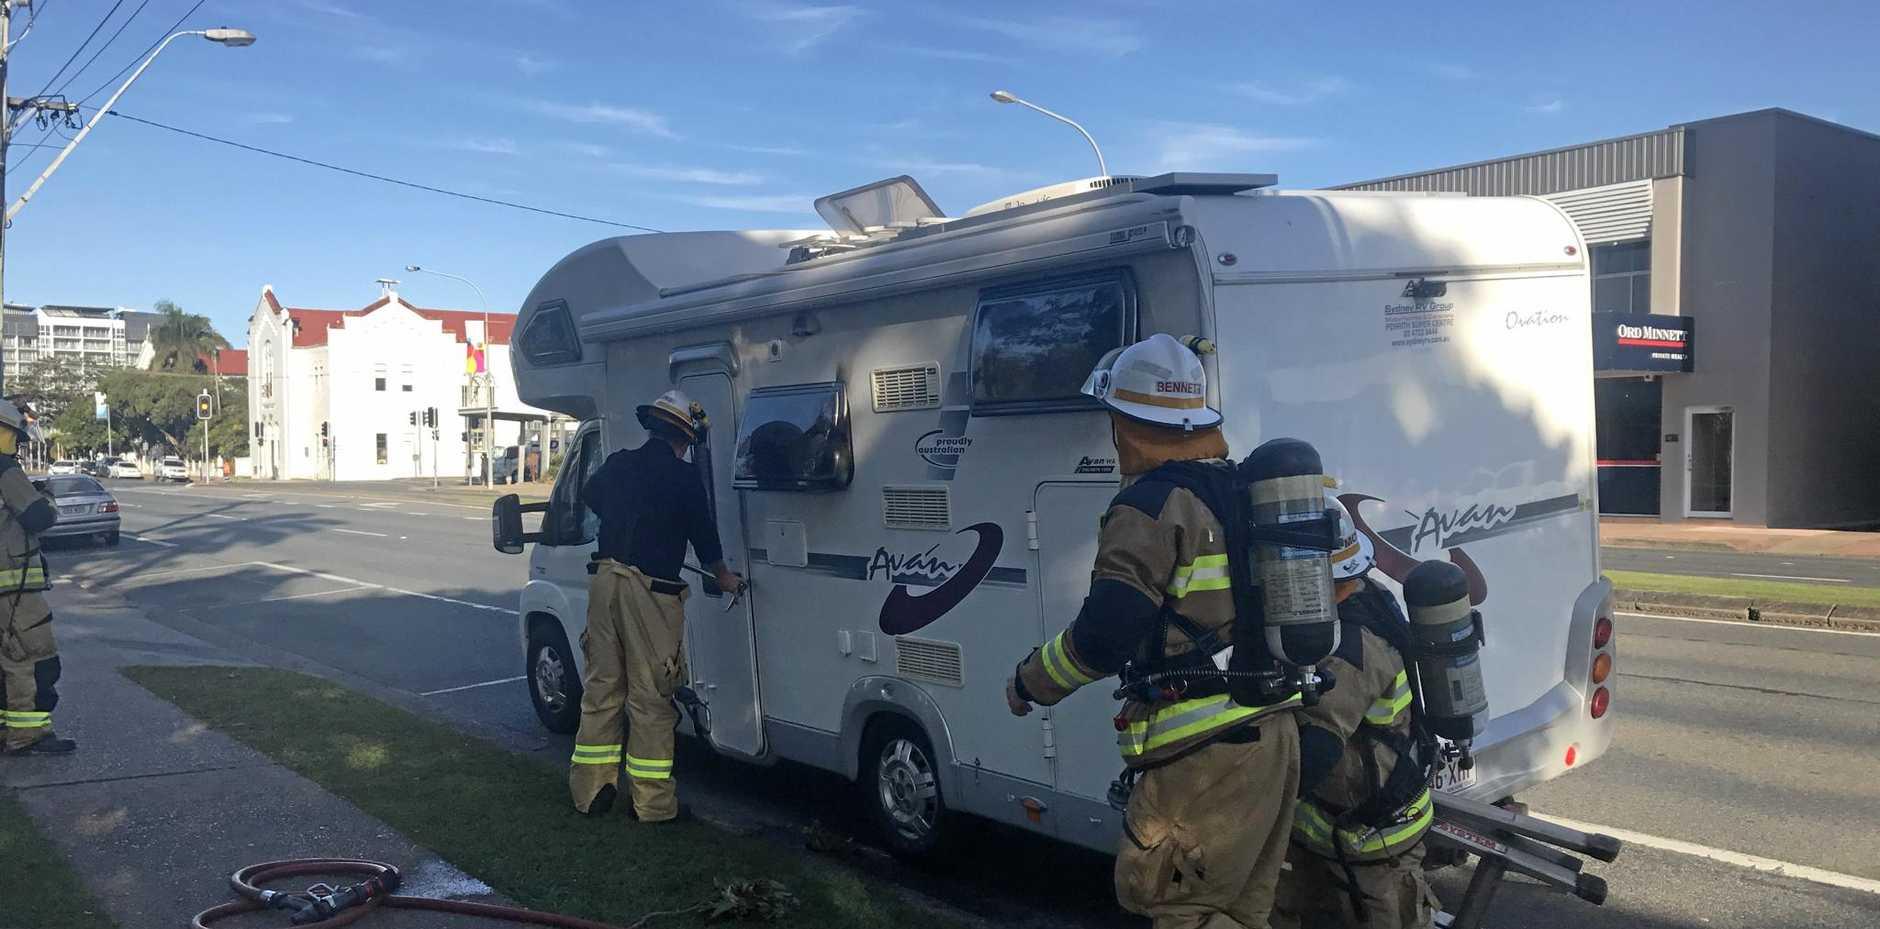 A camper van has caught fire on Gordon st.